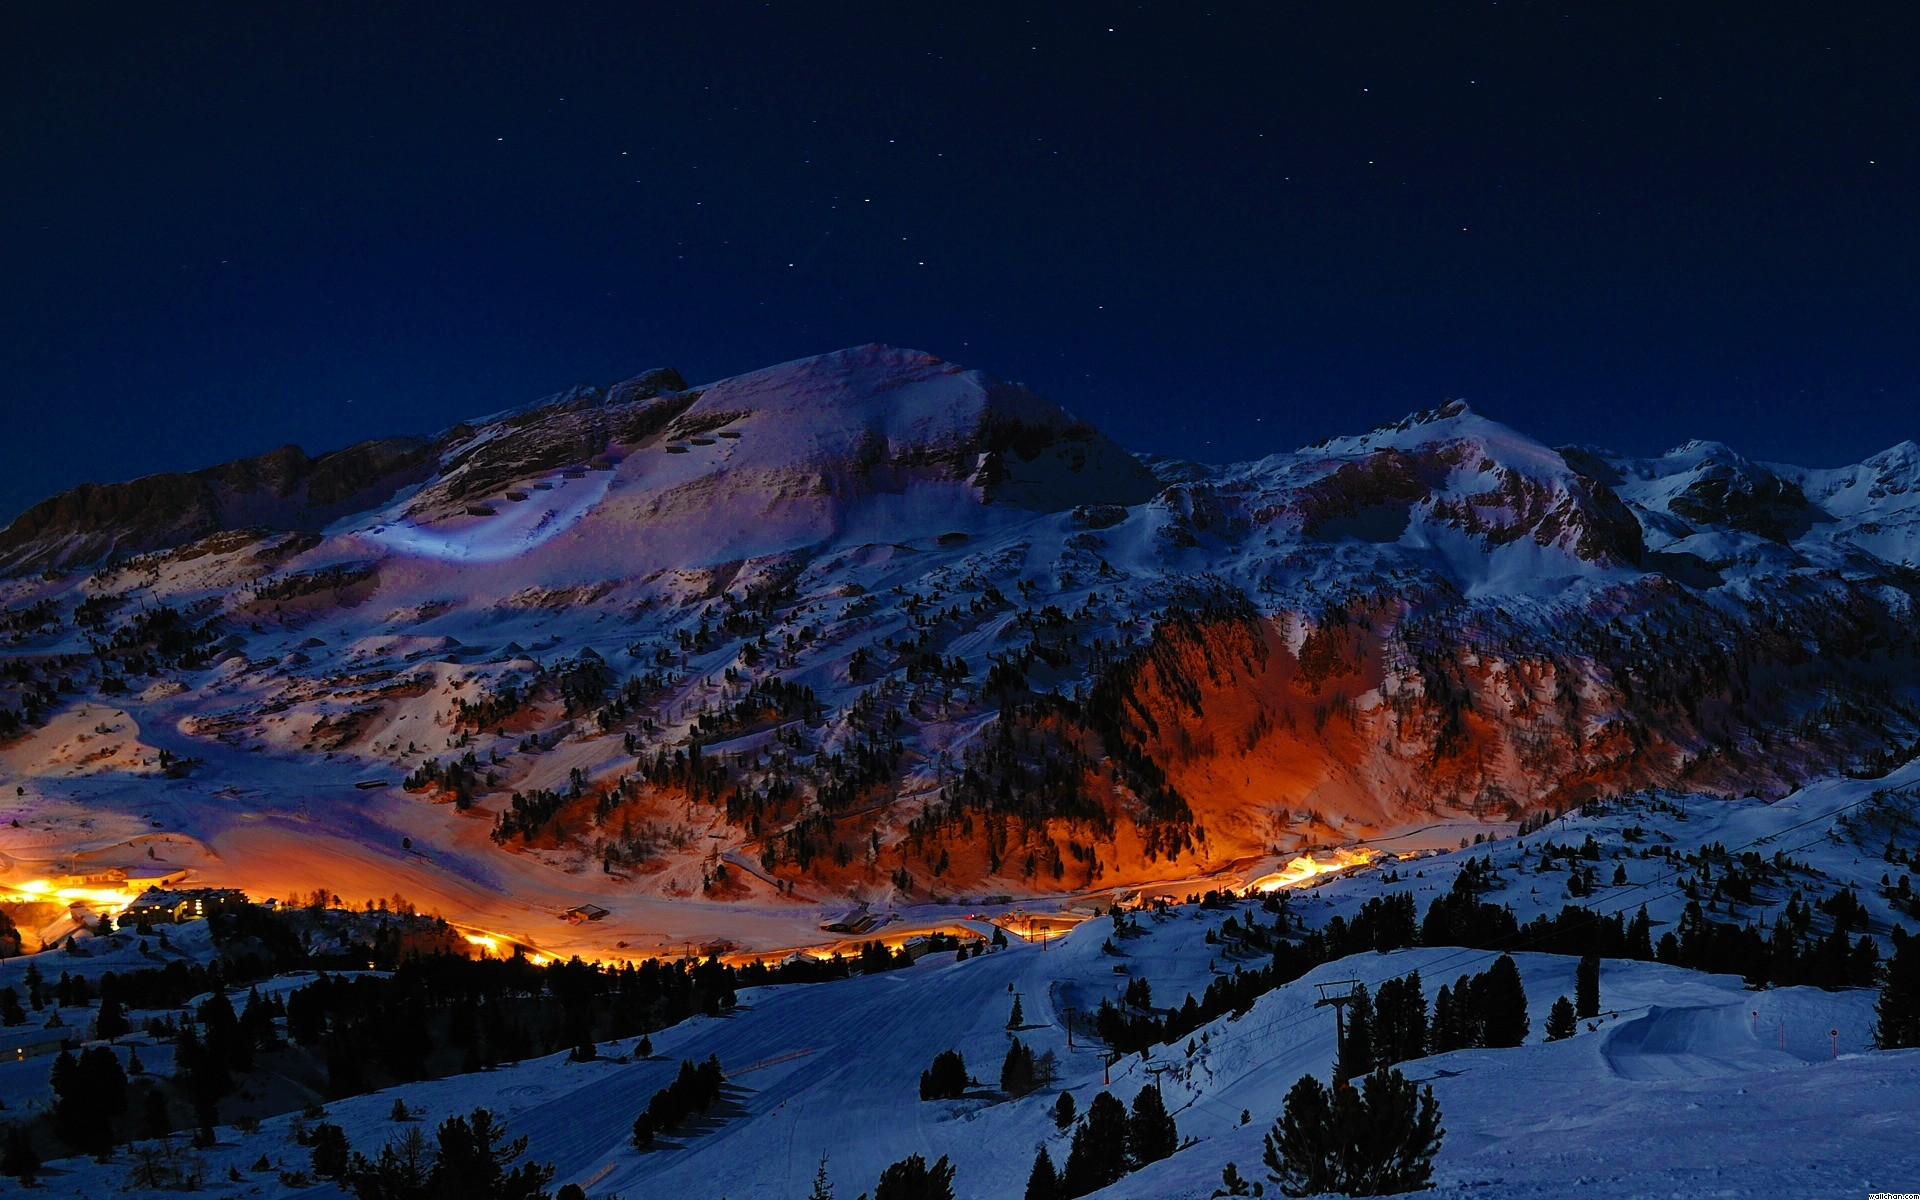 Night Mountain Wallpaper High Resolution For Desktop Wallpaper 1920 x 1200  px 692.31 KB night snow